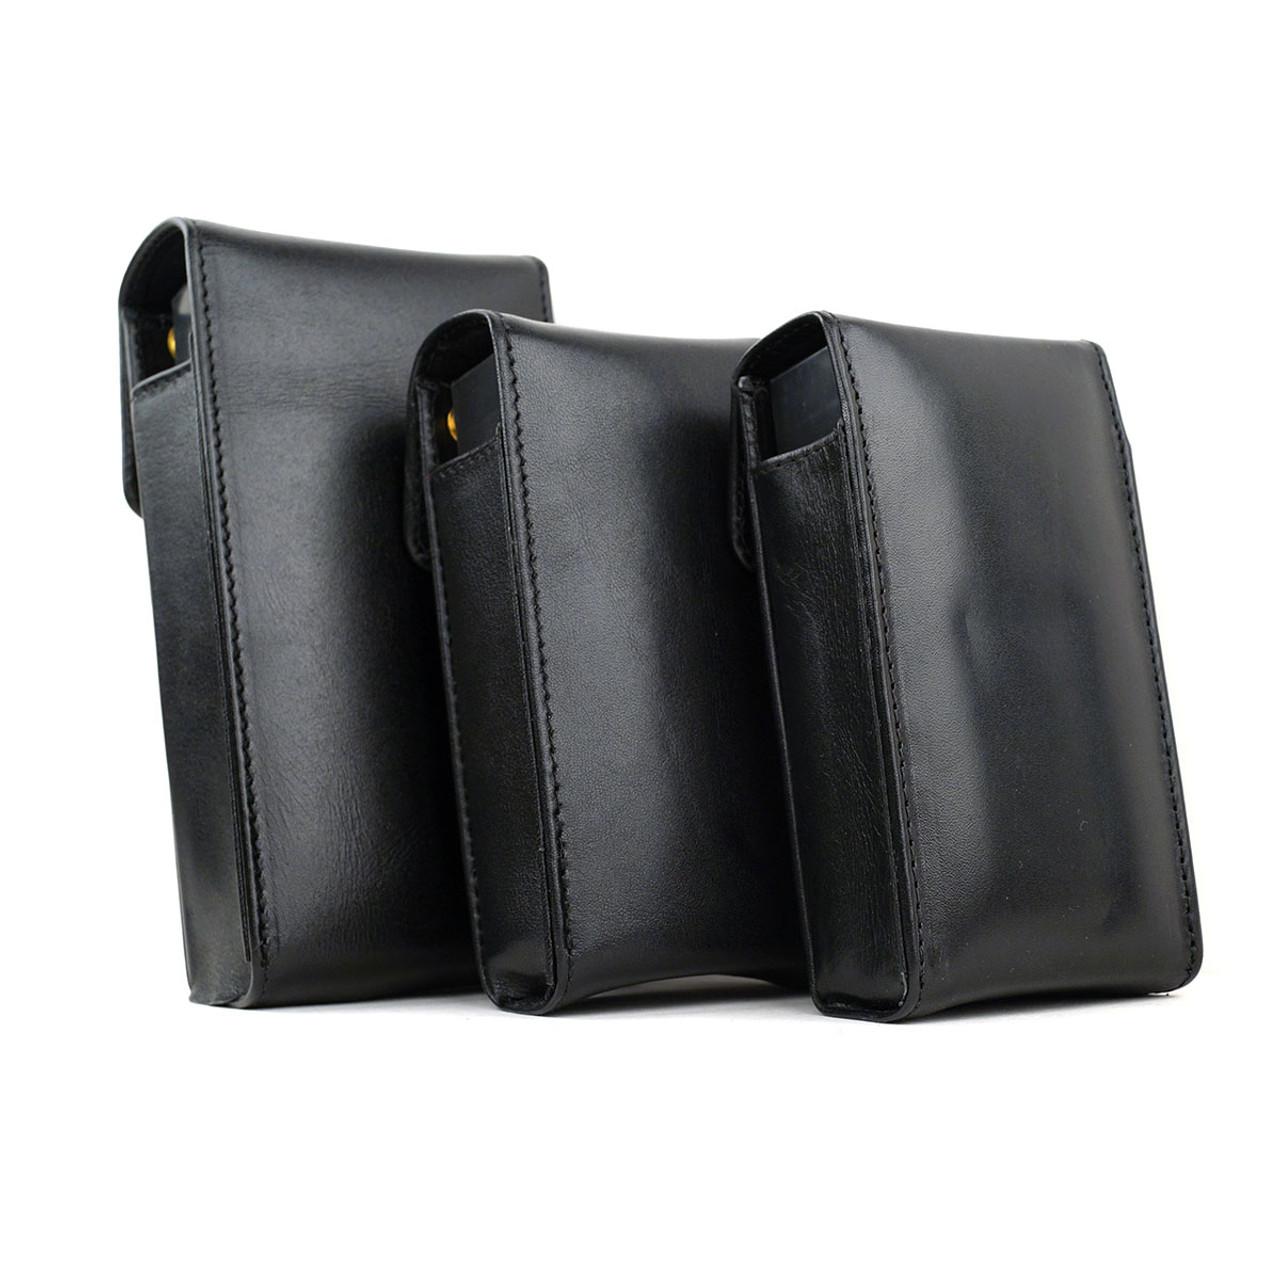 Keltec PF9 Leather Arsenal 50 Round Belt Case